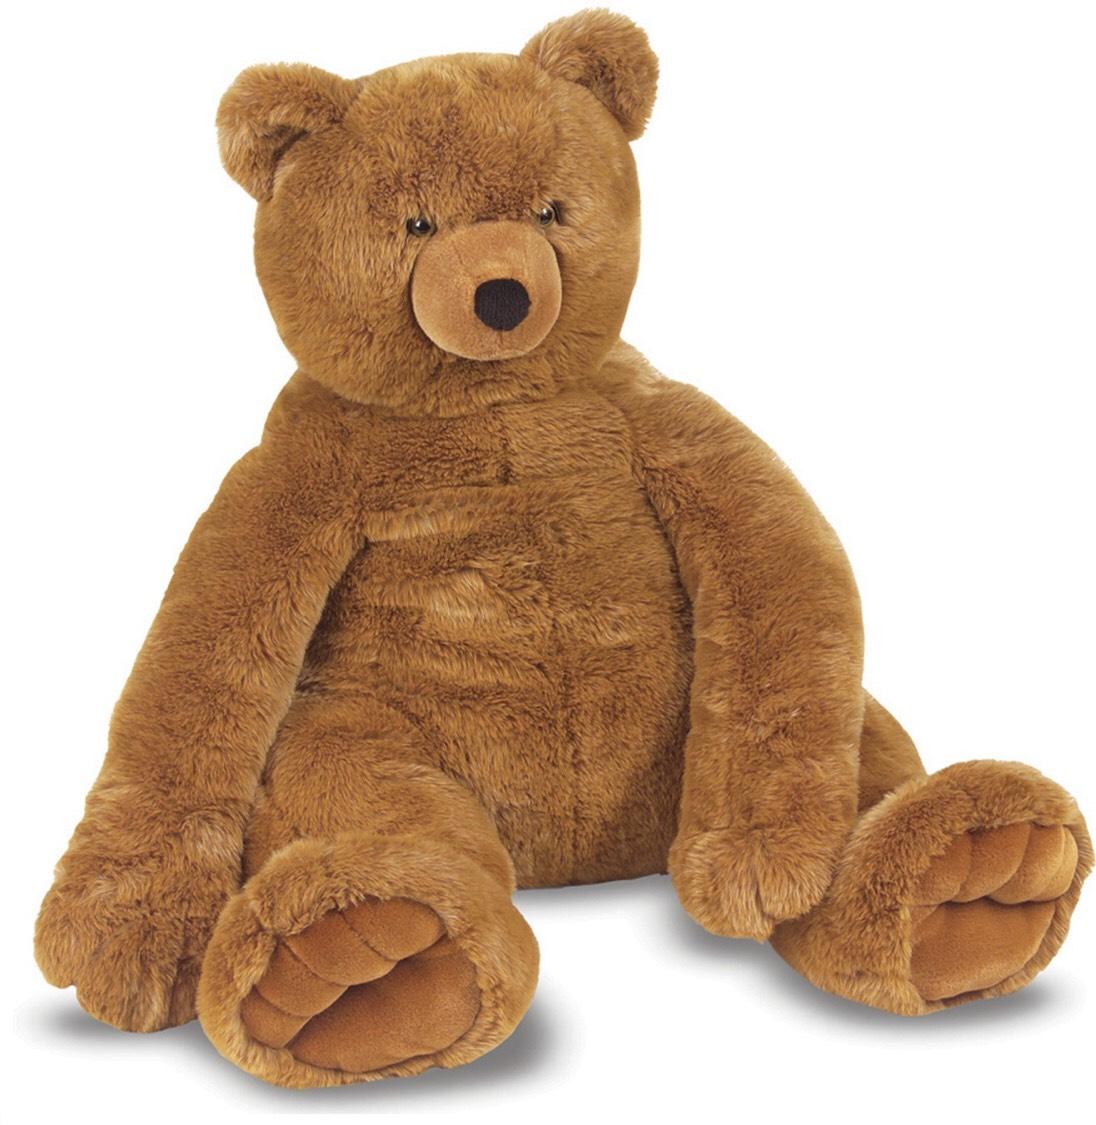 Melissa & Doug - Jumbo Teddy Bear Plush Soft Toy £37.50 @ Debenhams (£30 with code: md37)